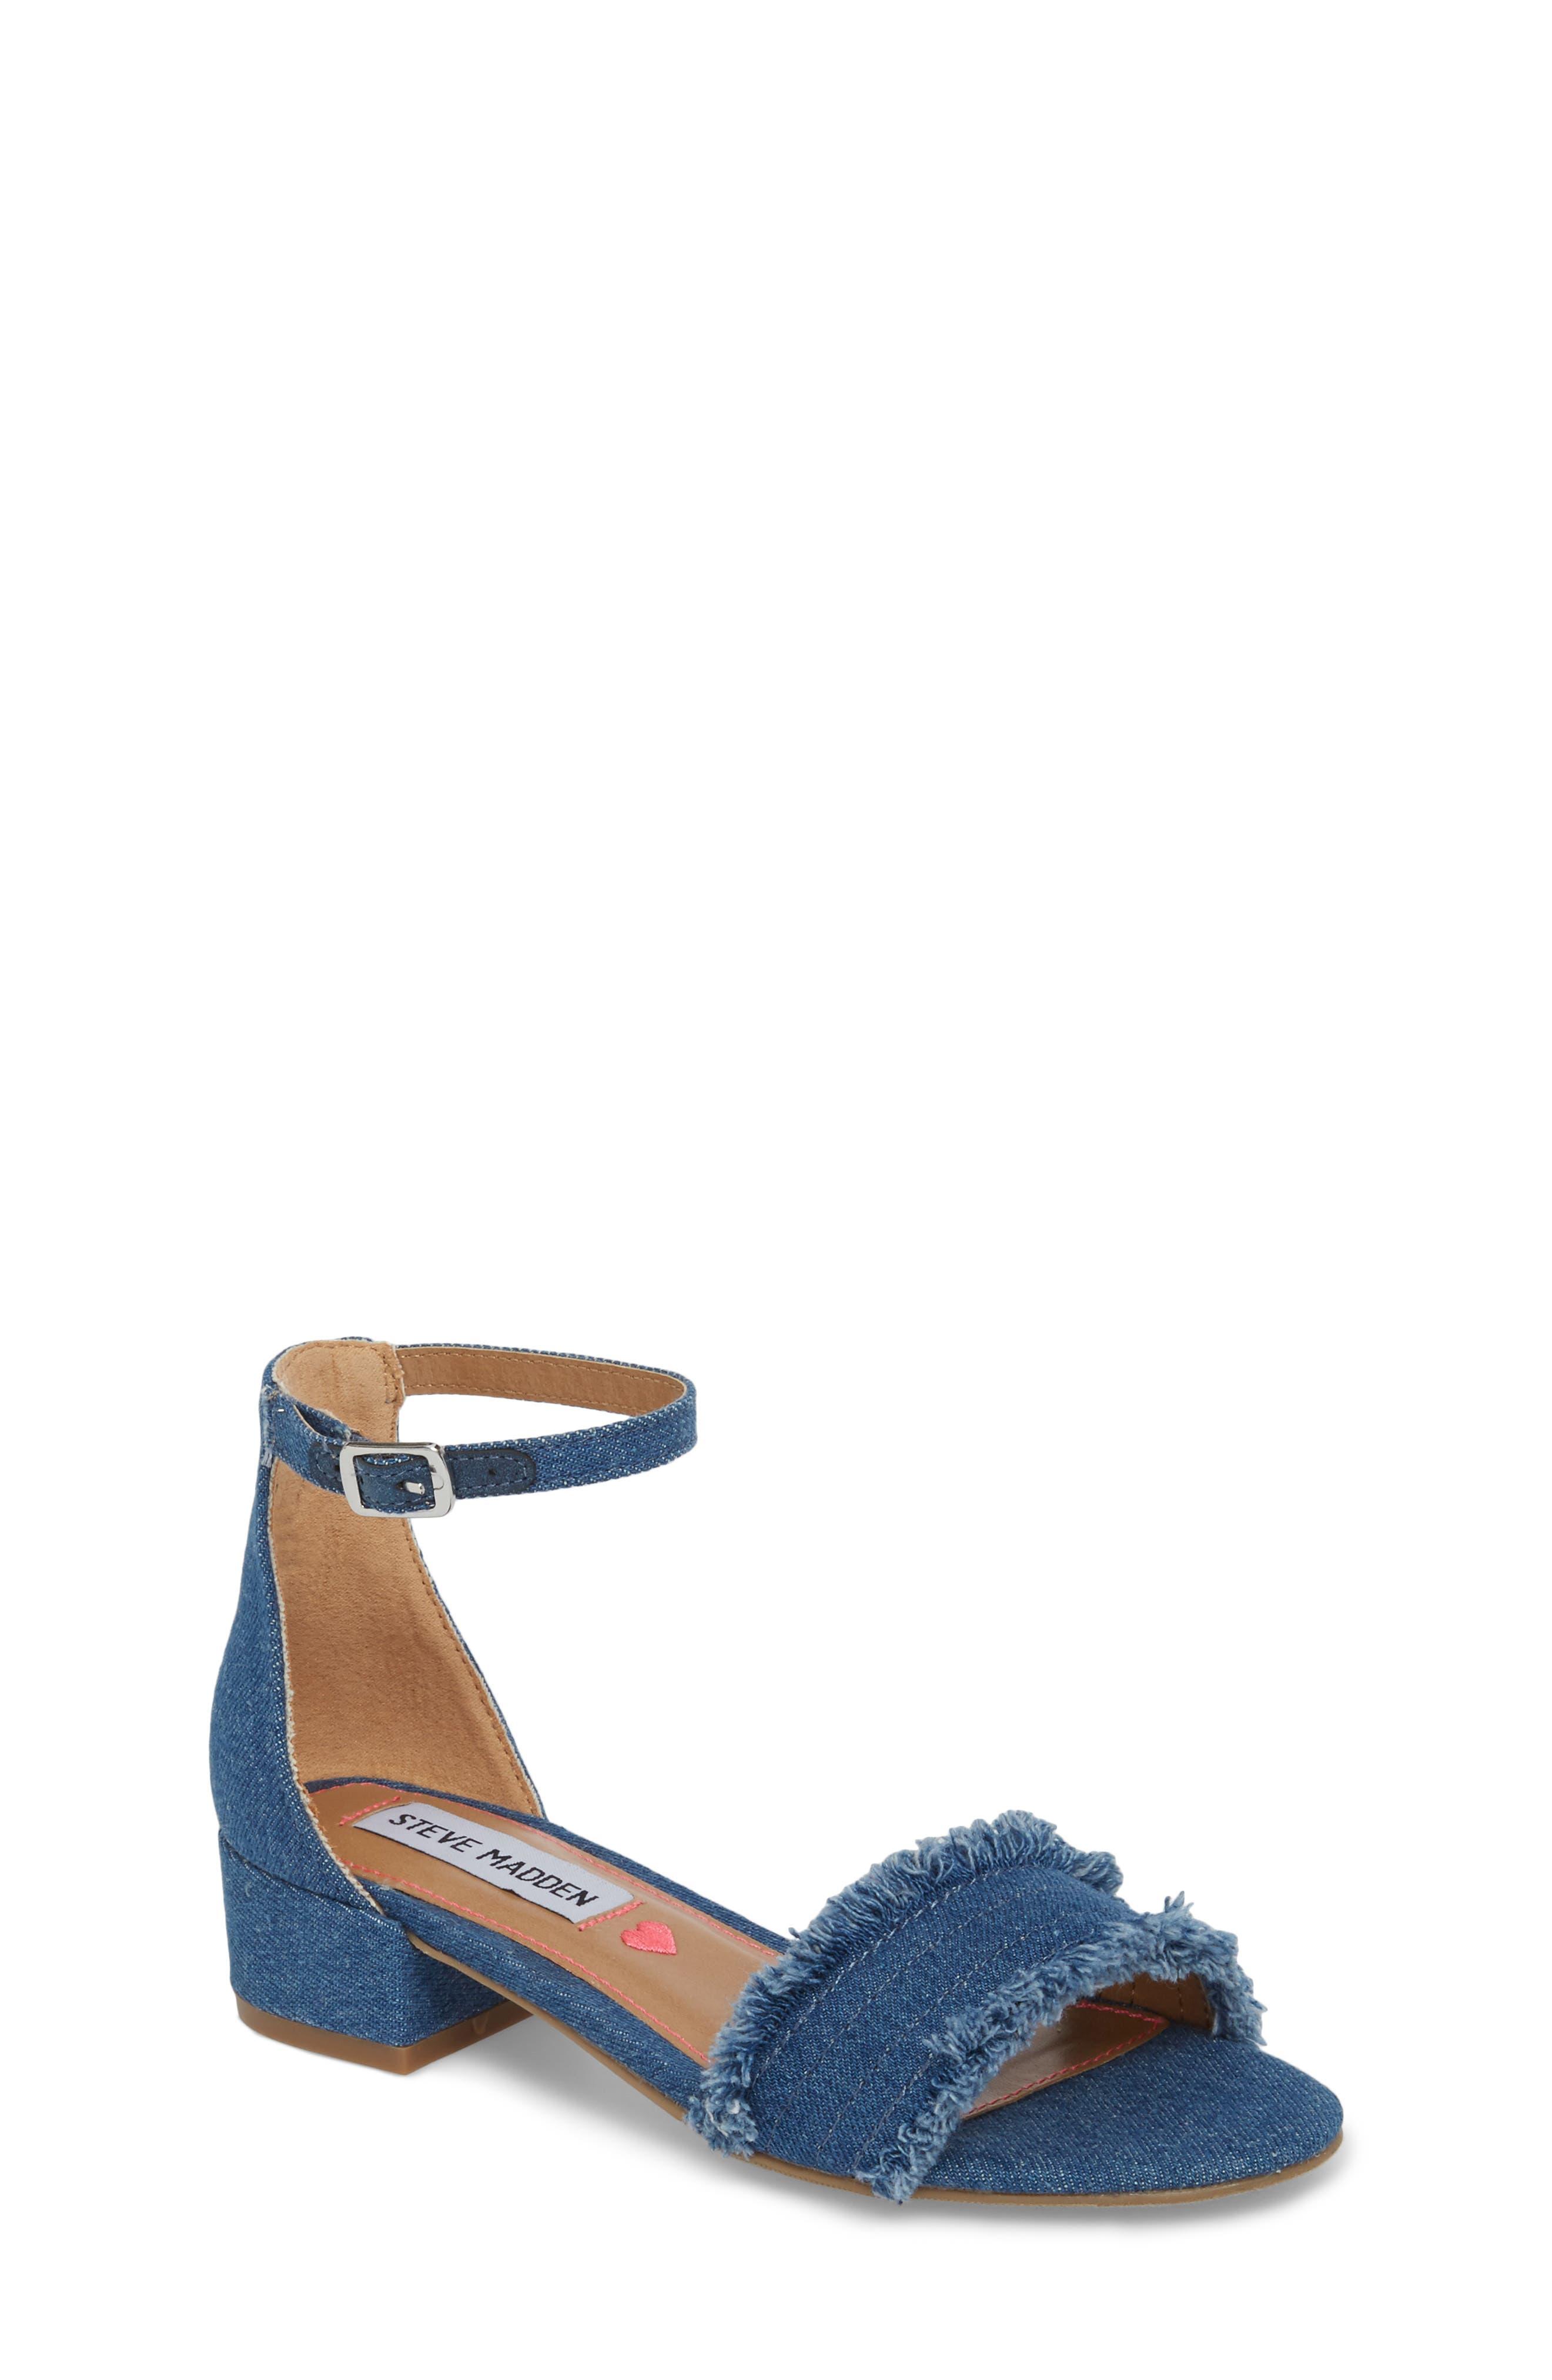 Jirene Metallic Sandal,                             Main thumbnail 1, color,                             401